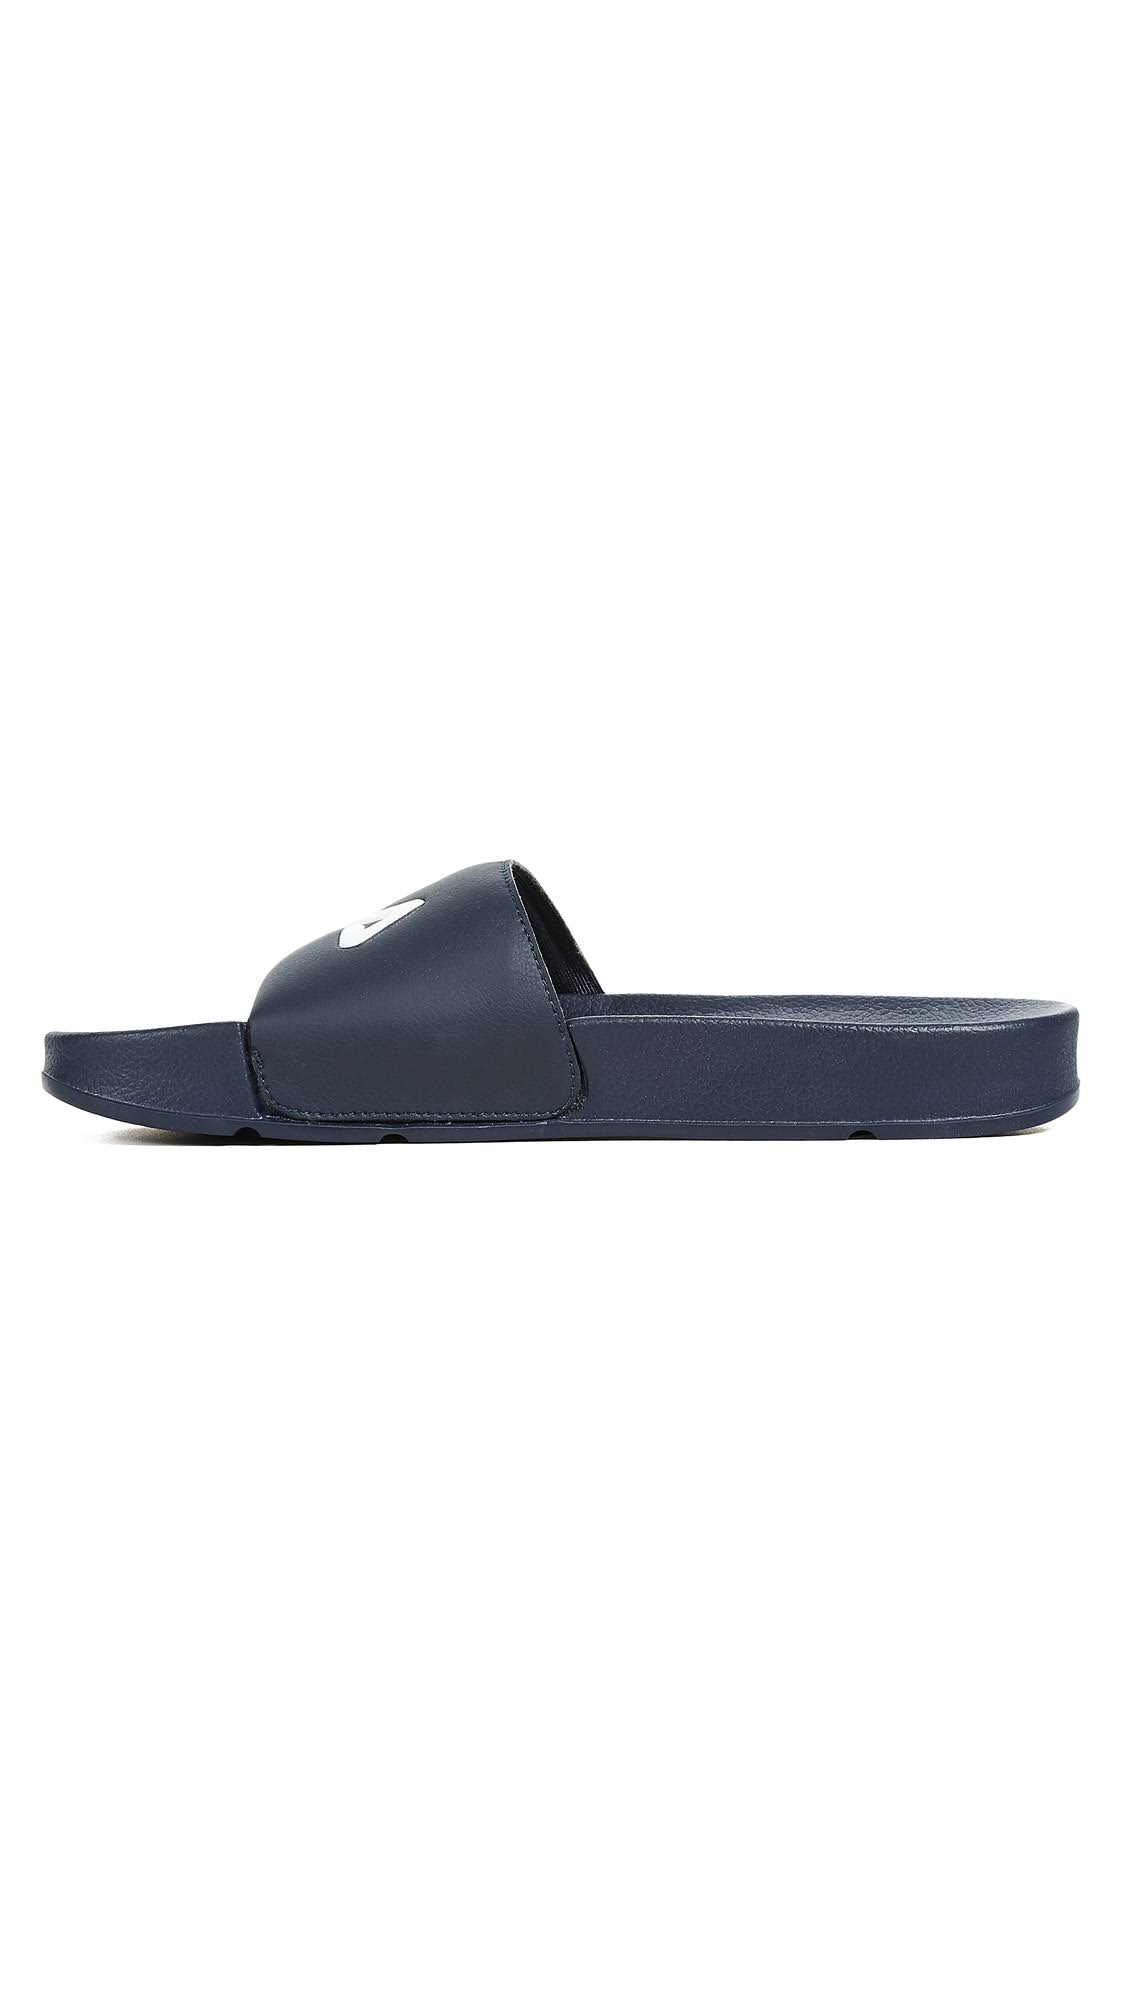 Drifter Sandals Navy 422u18 1vs10000 Fila Men's 514zxwqv